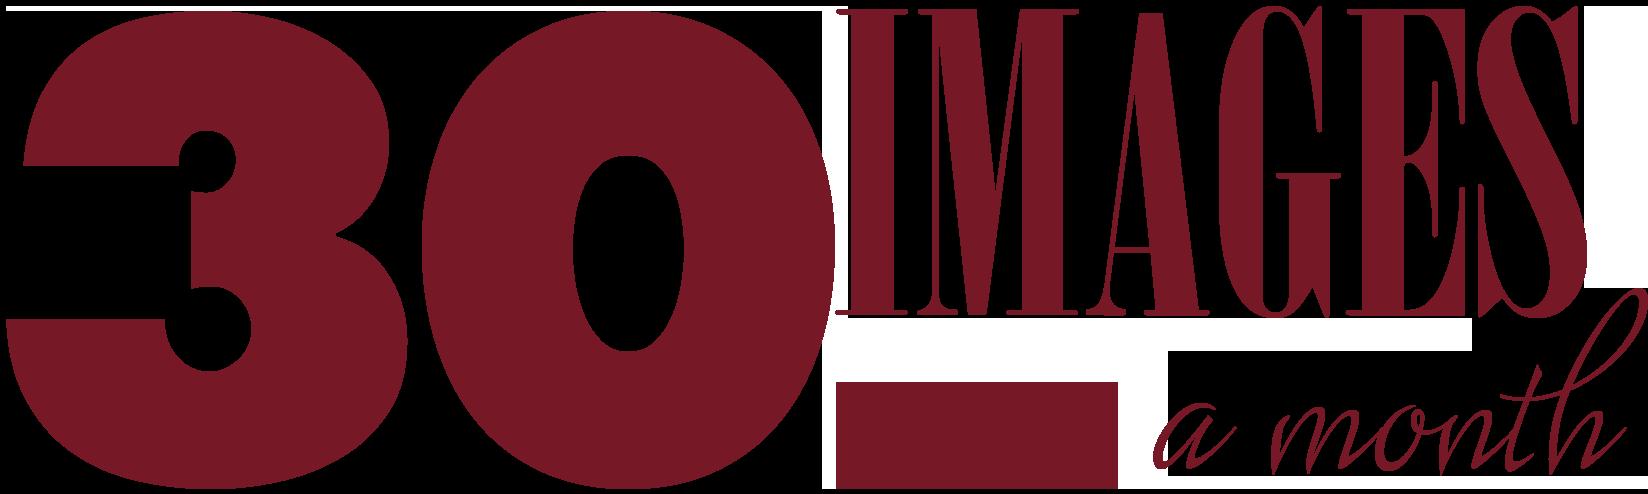 30-images-logo